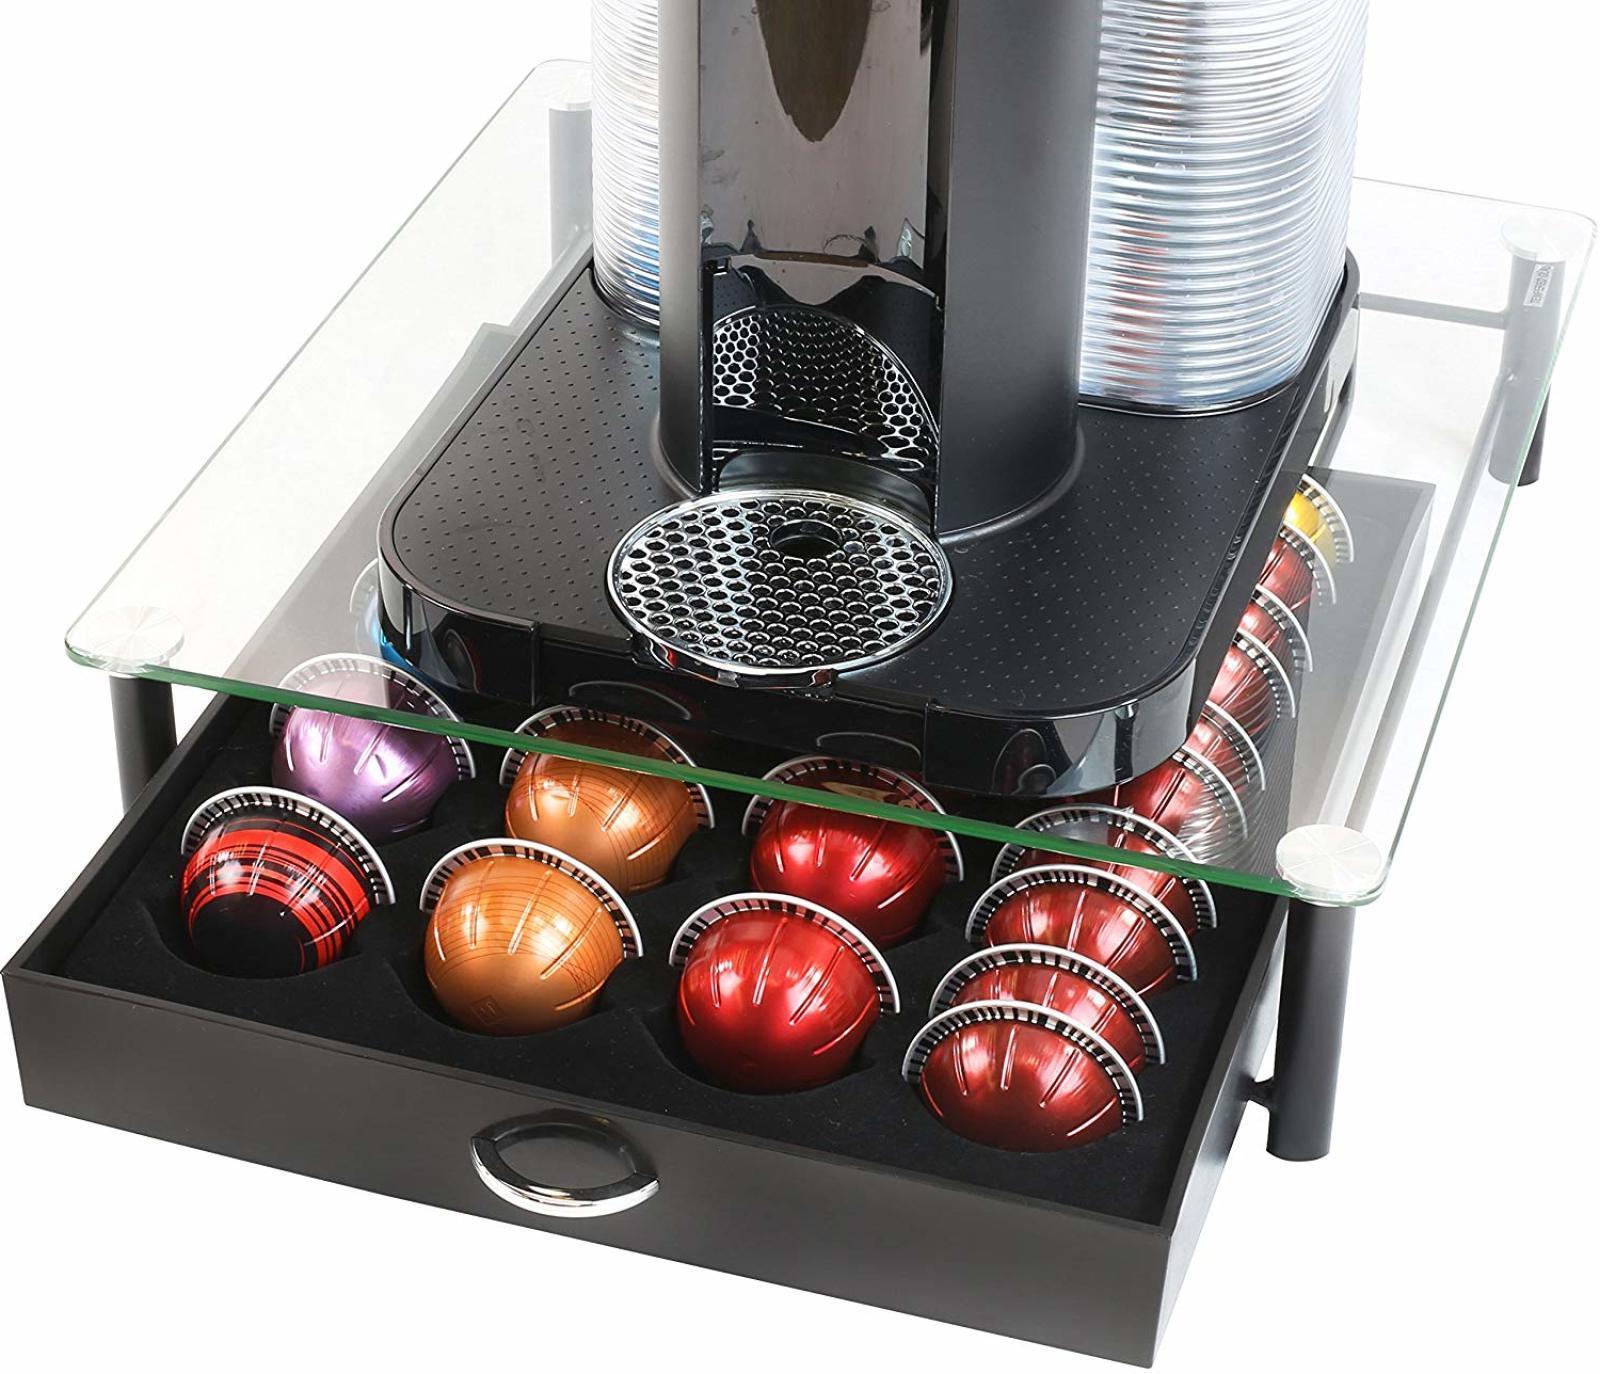 DecoBros Crystal Tempered Glass Nespresso Coffee Storage Dra